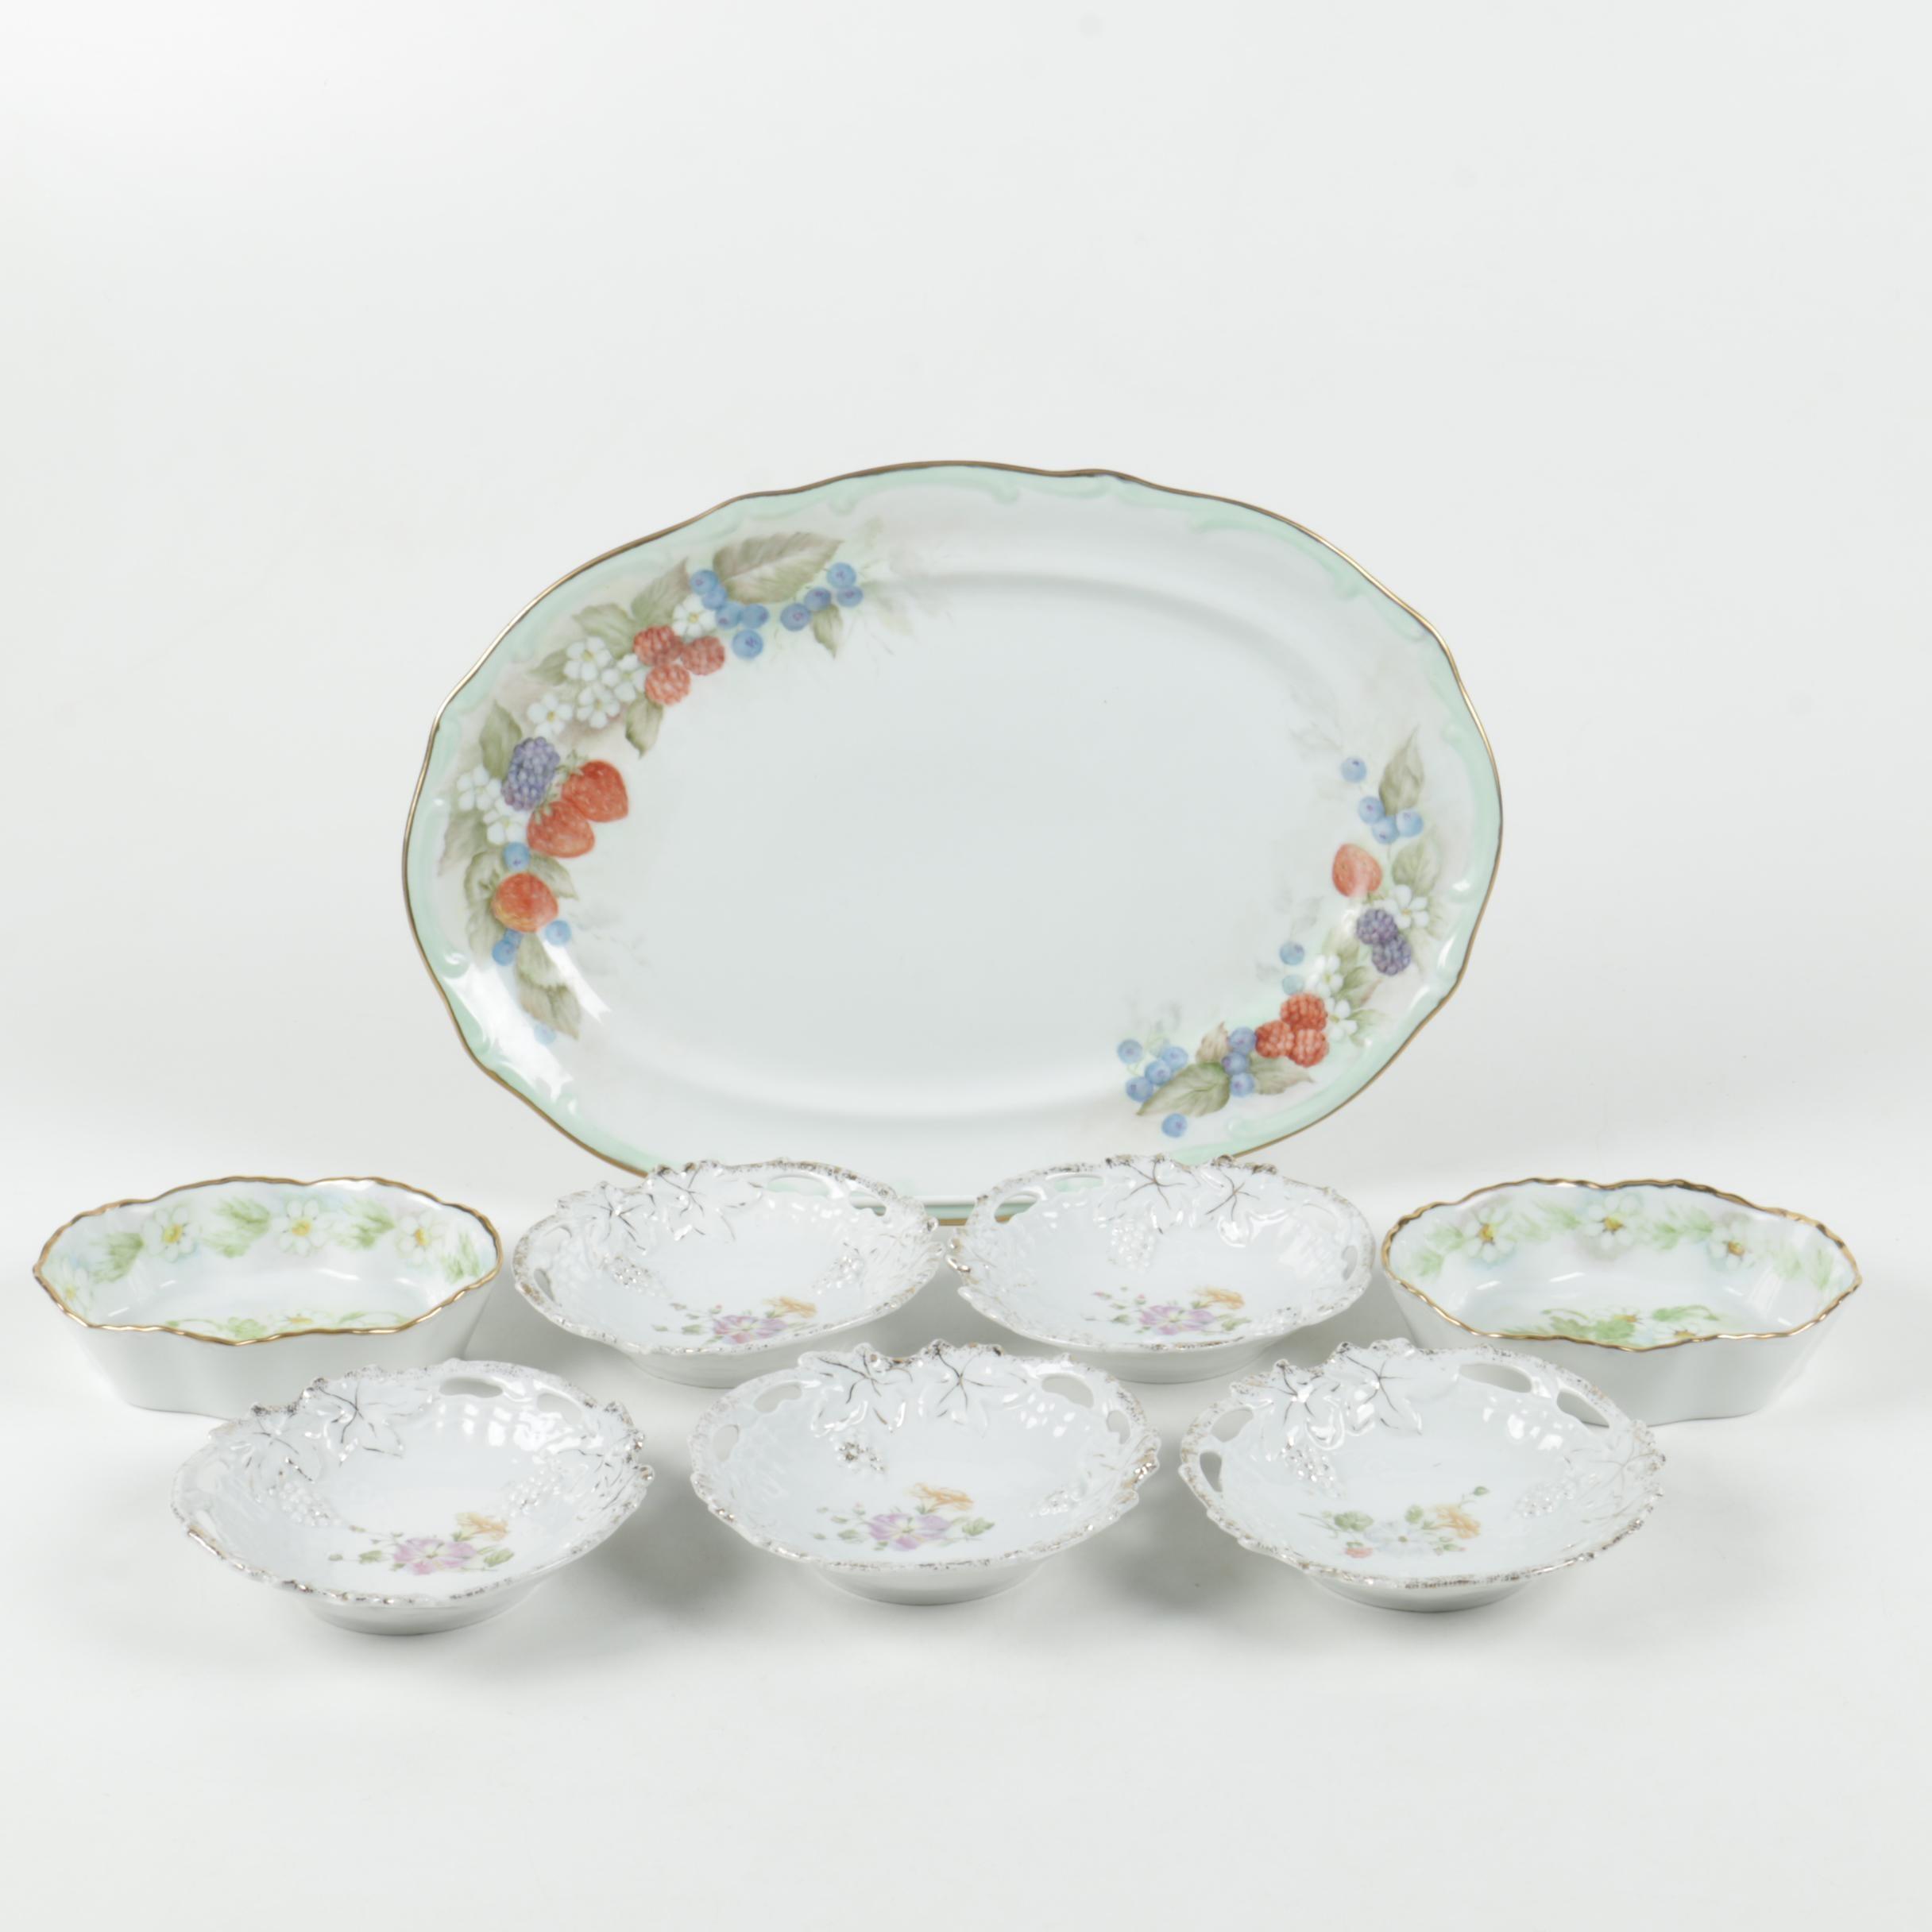 Vintage Hand Painted Porcelain Serveware Including Vohenstrauss